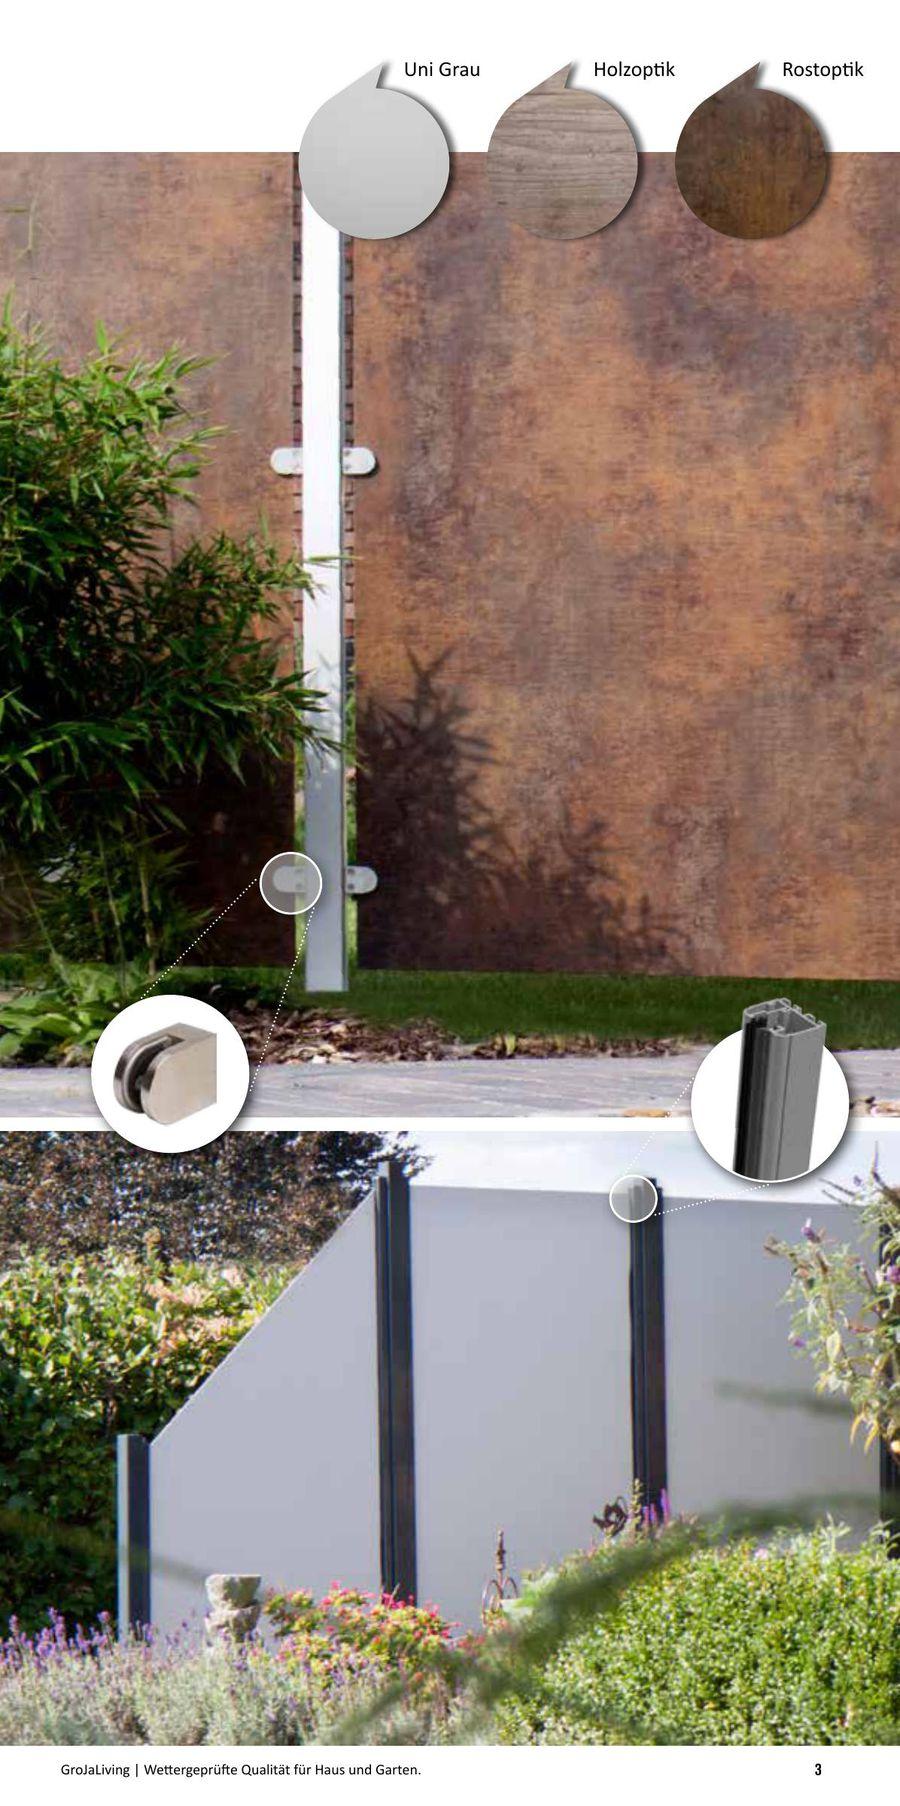 Kunststoff Sichtschutz In Holzoptik Kunststoffbretter In Holzoptik